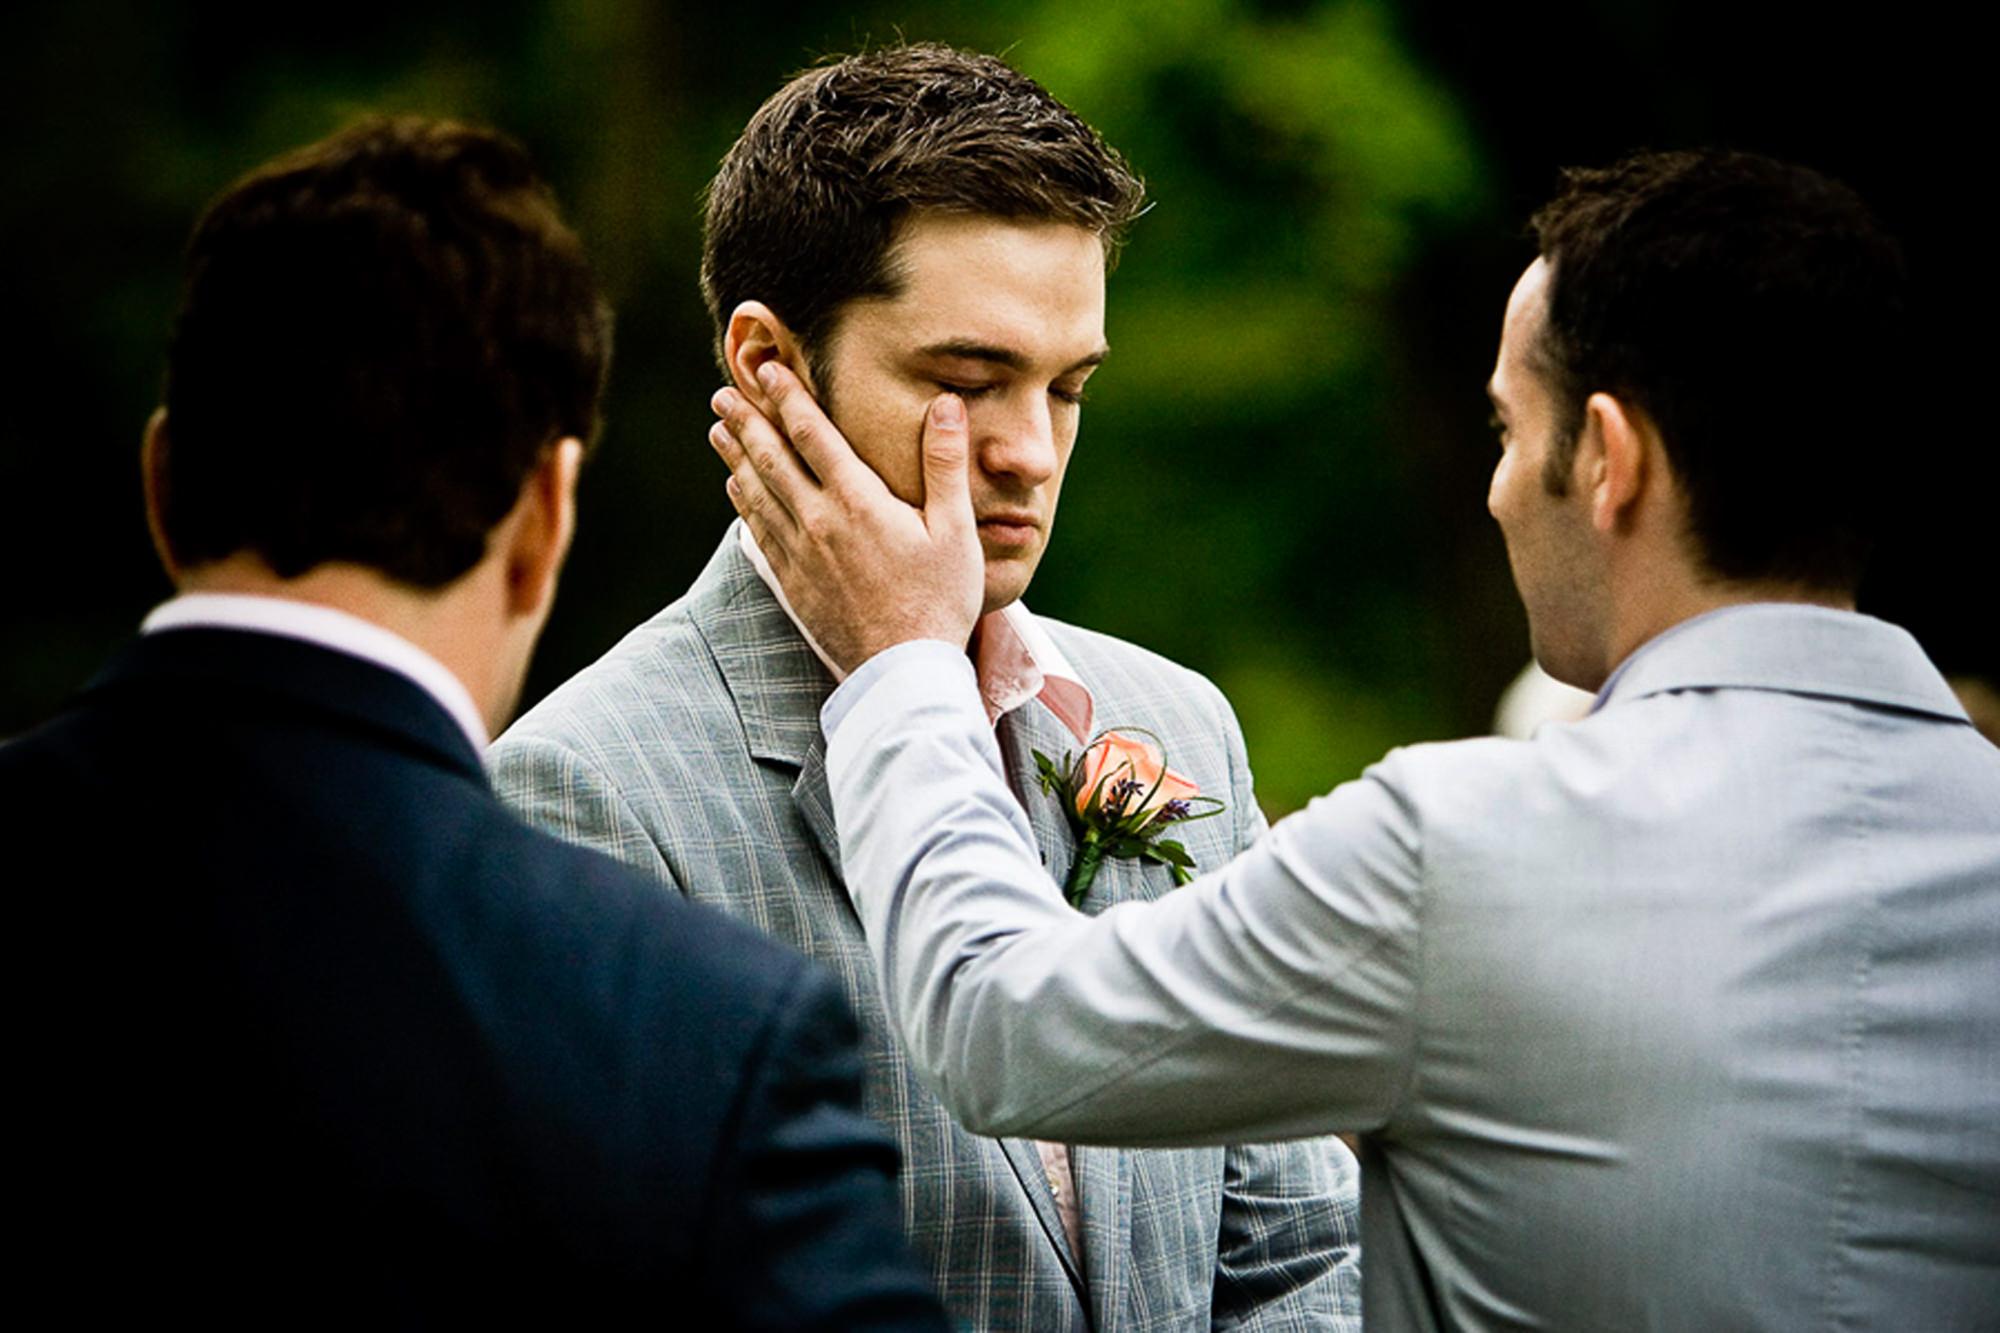 ay-wedding-groom-wiping-tears-off-groom-during-ceremony-worlds-best-wedding-photos-jag-studios-connecticut-wedding-photographers